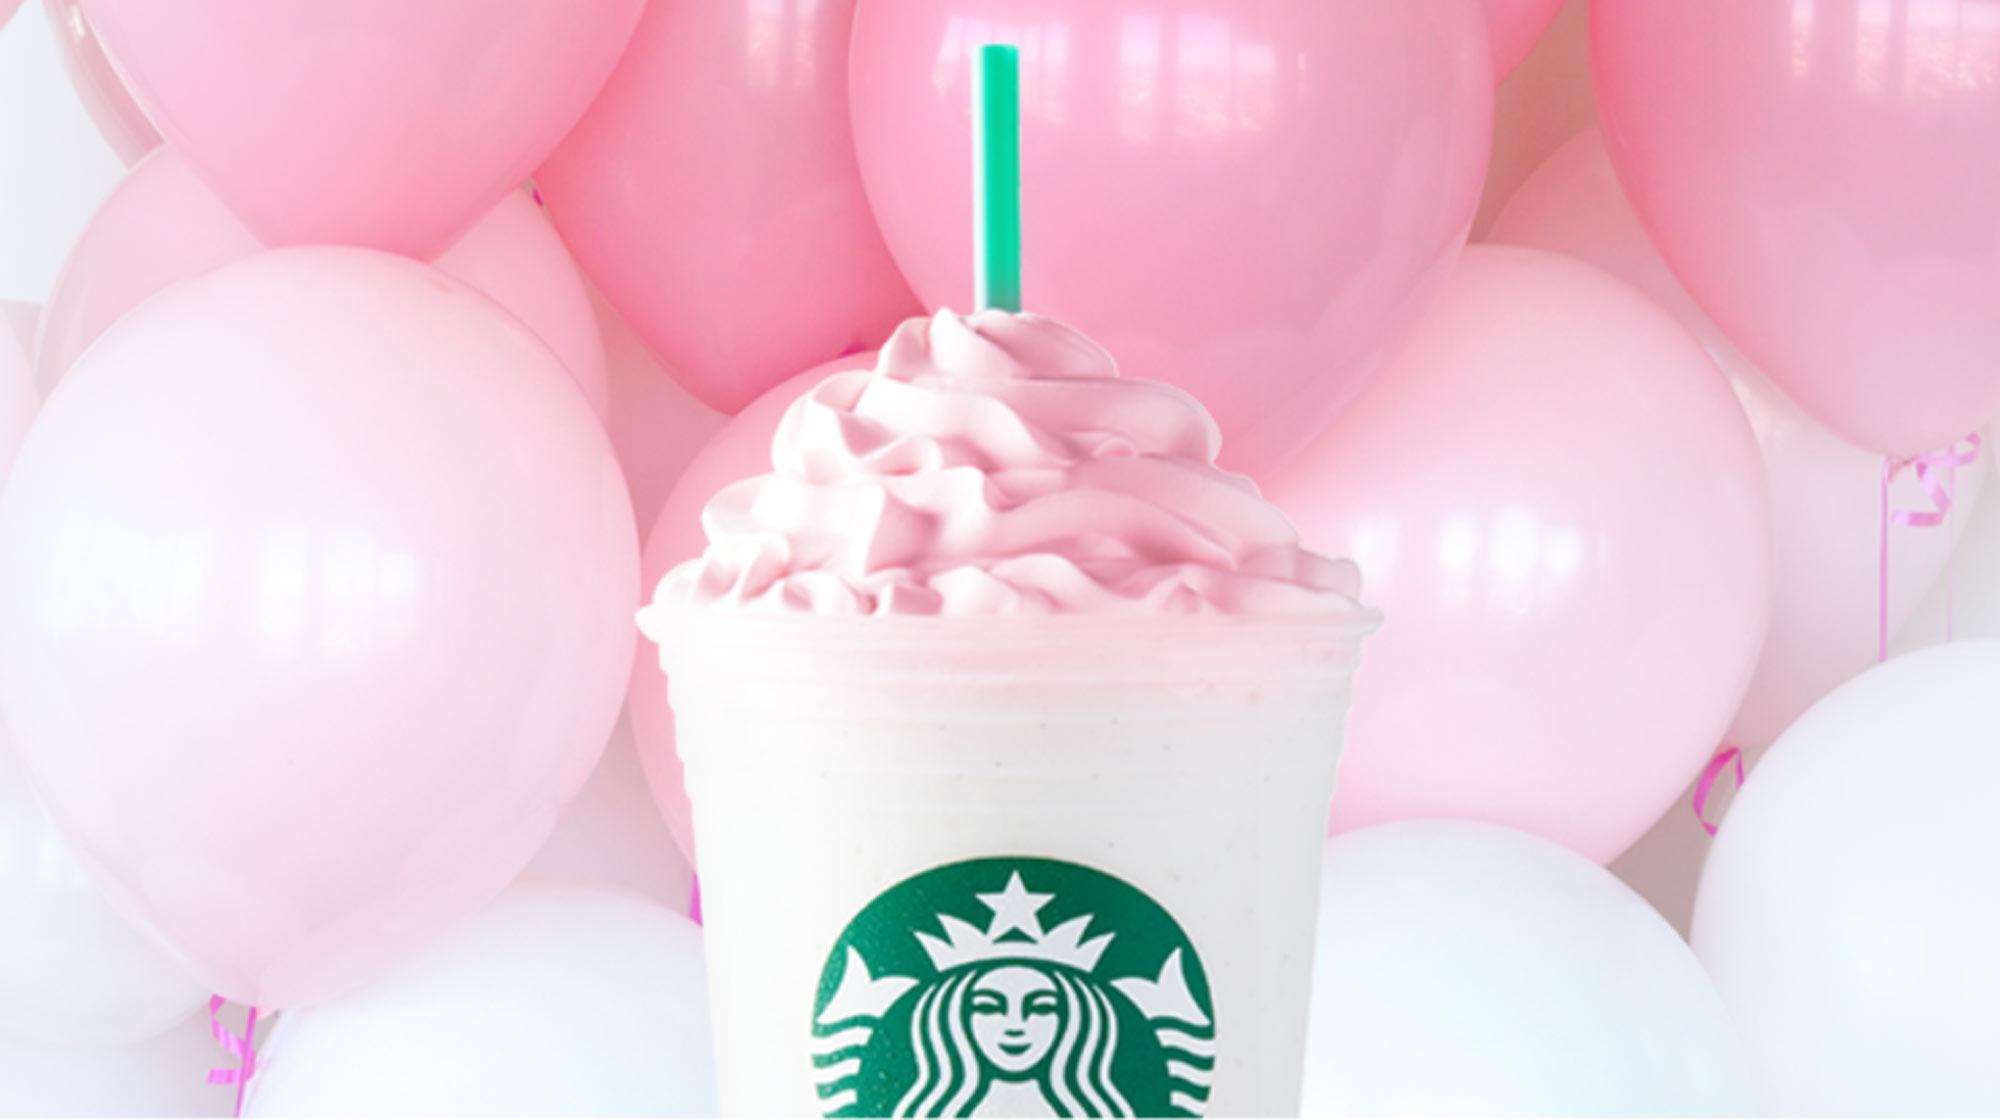 Starbucks Birthday Cake Frappuccino Back on Menu for ...